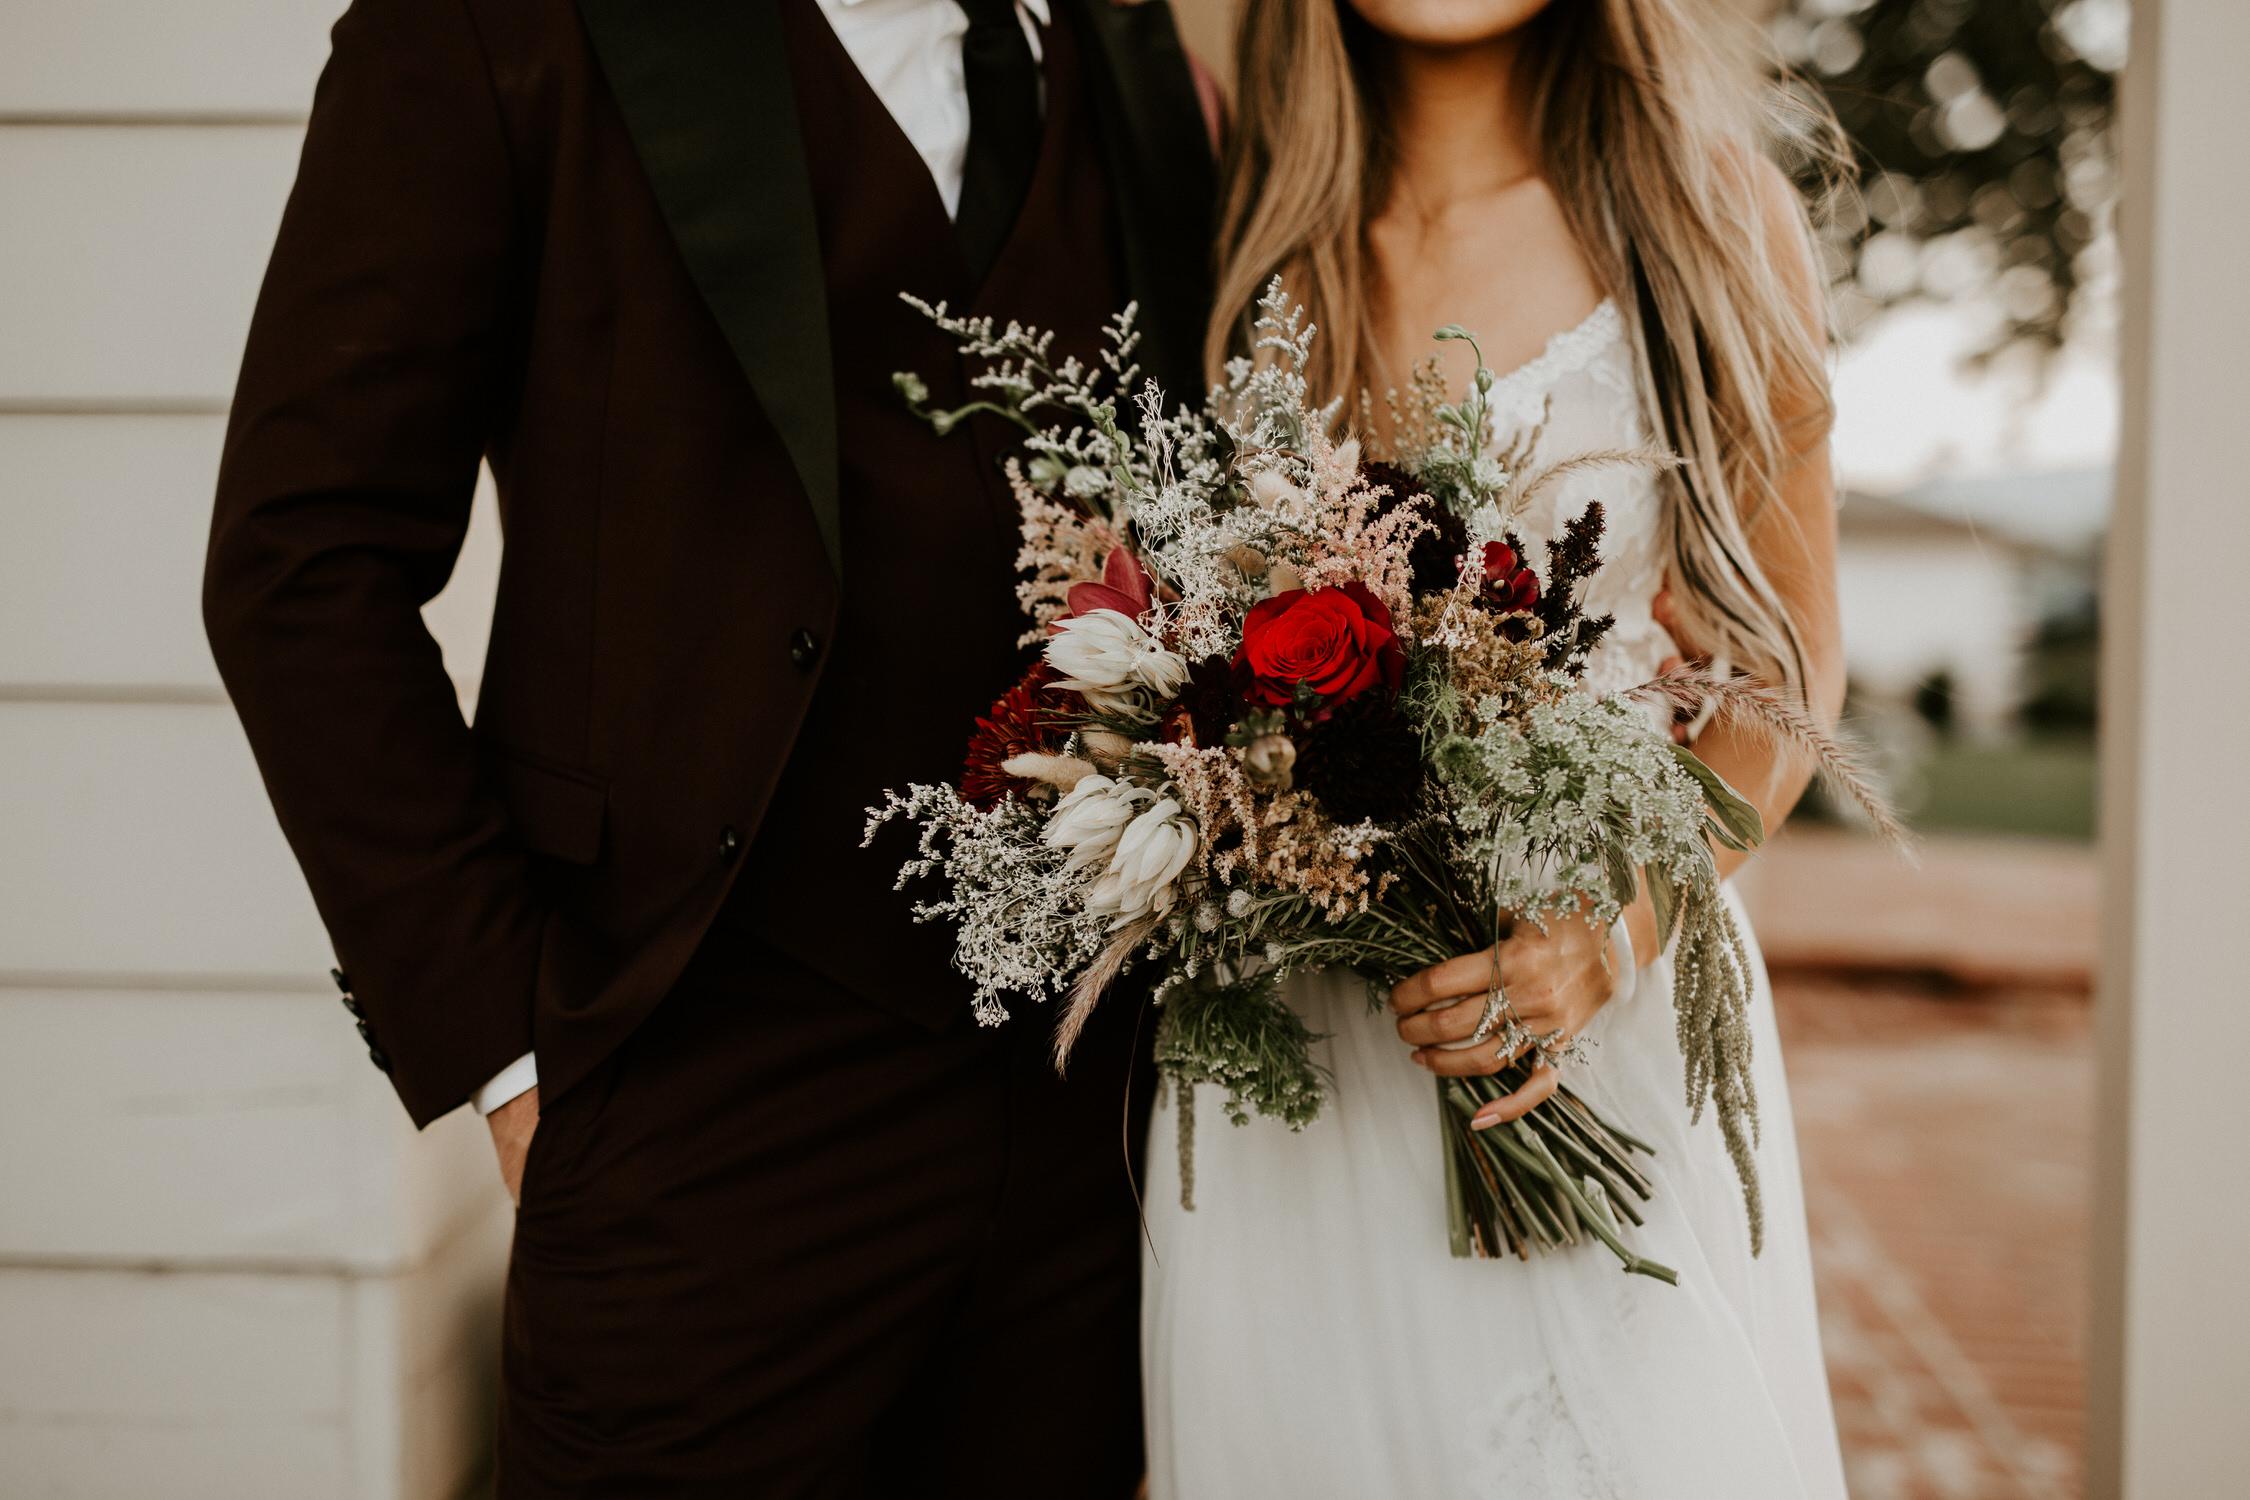 couple-intimate-wedding-northern-california-145.jpg